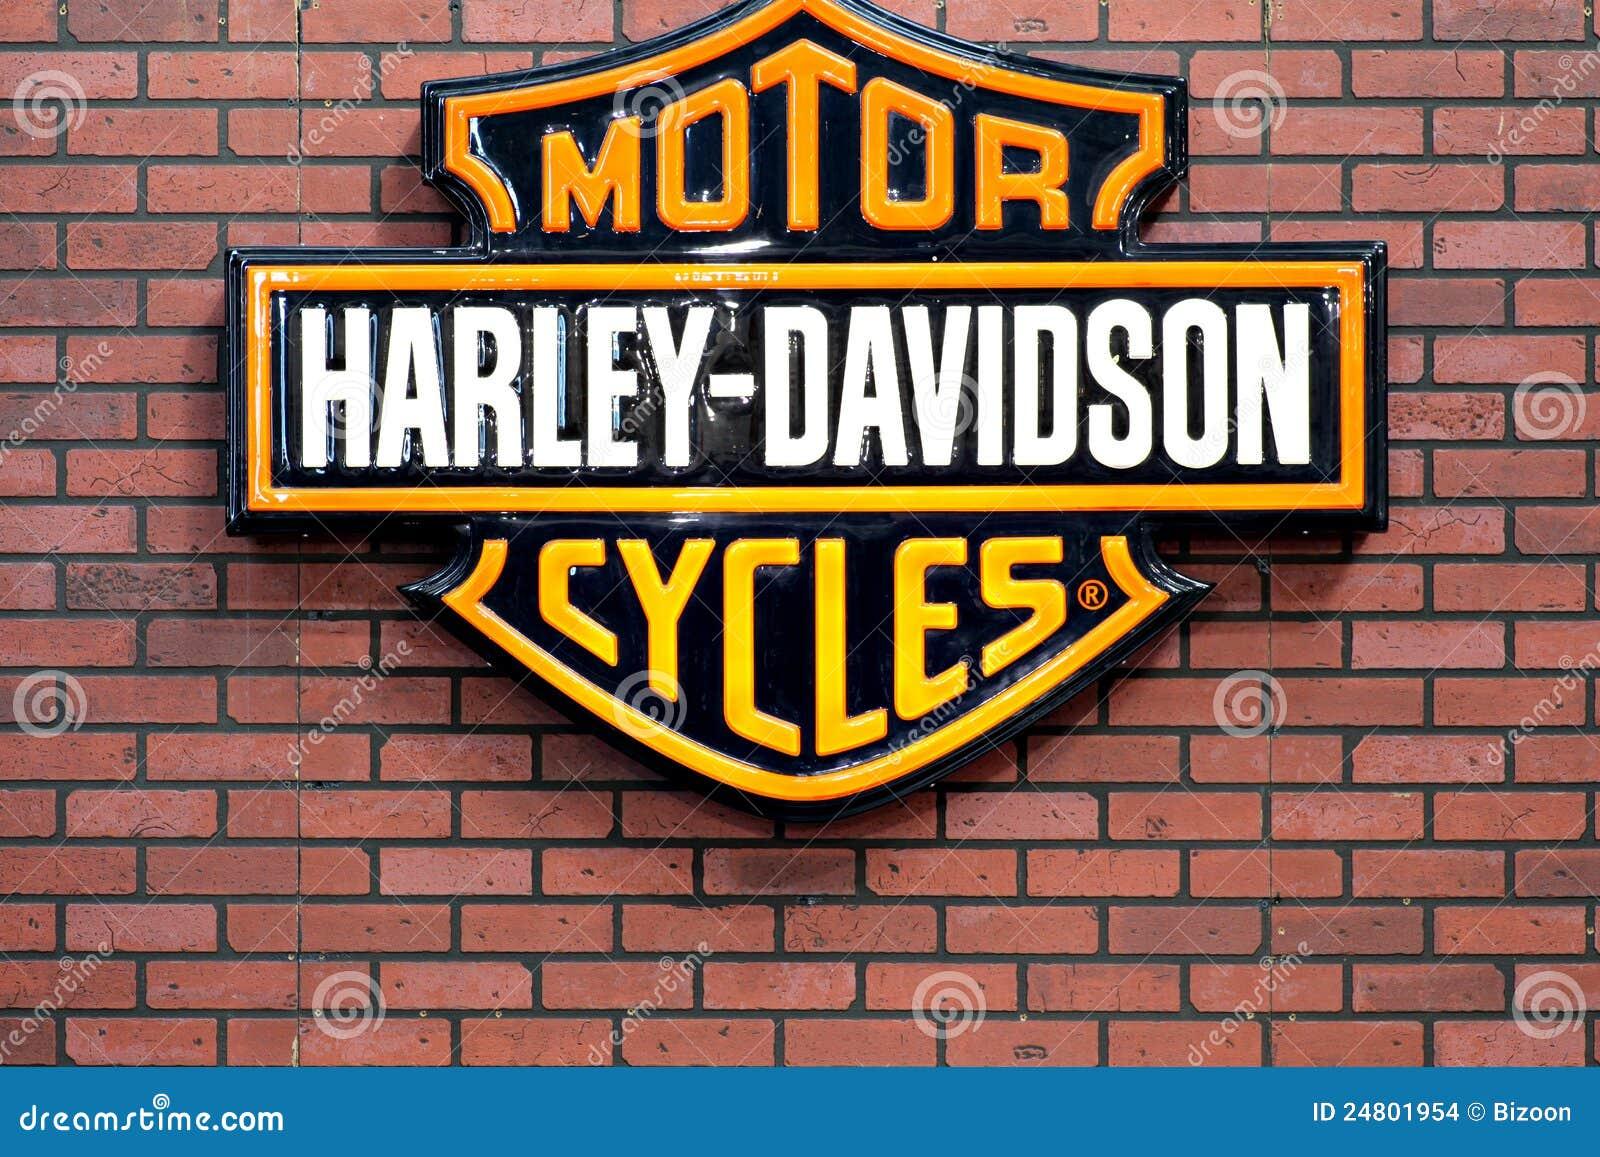 Harley Davidson Logo Editorial Stock Image - Image: 24801954